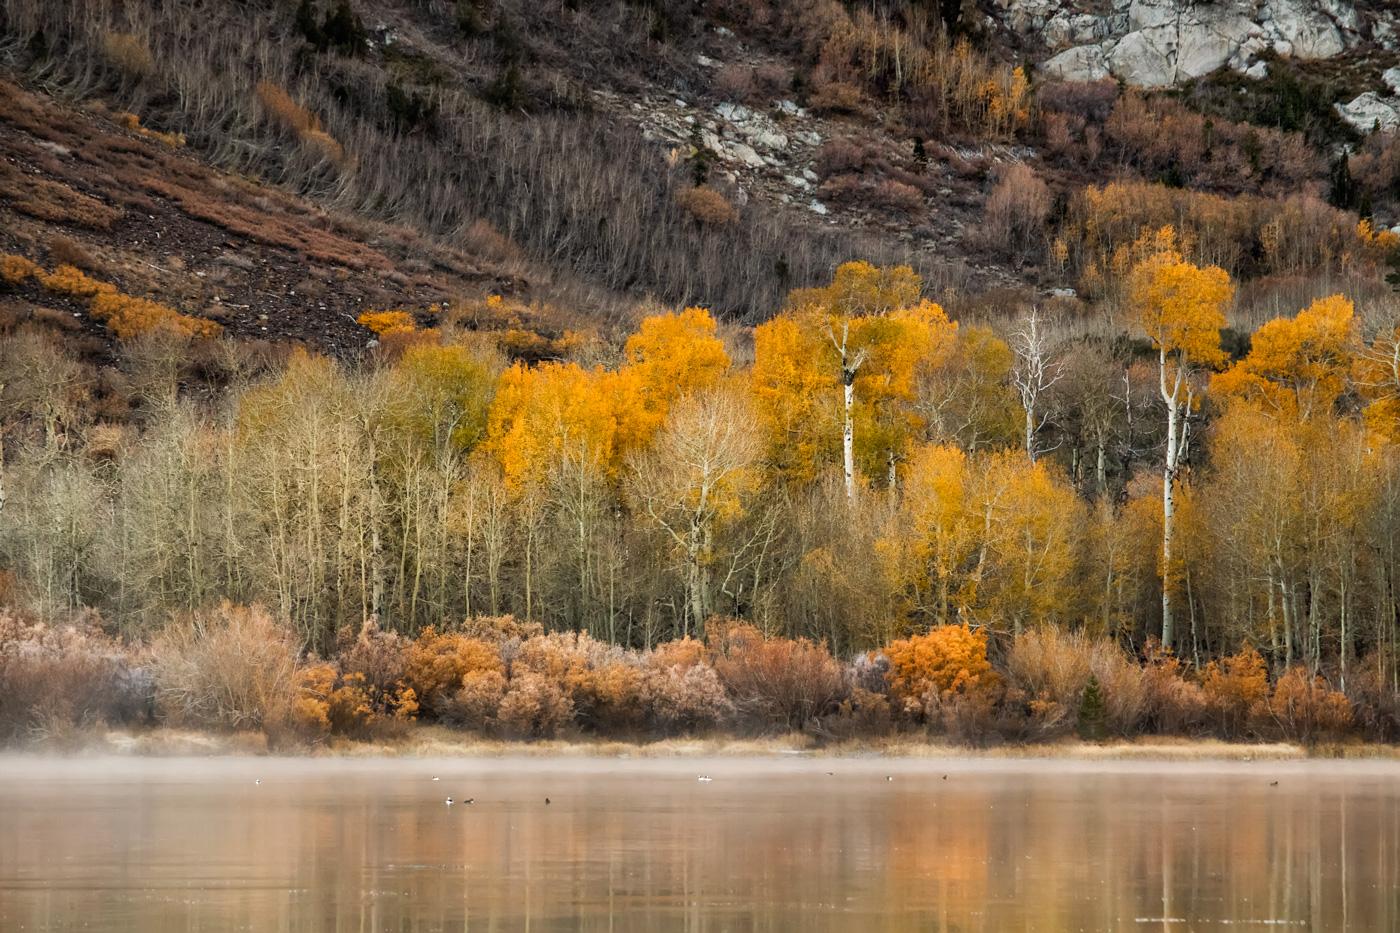 Parker Lake Autumn Foliage - Eastern Sierra